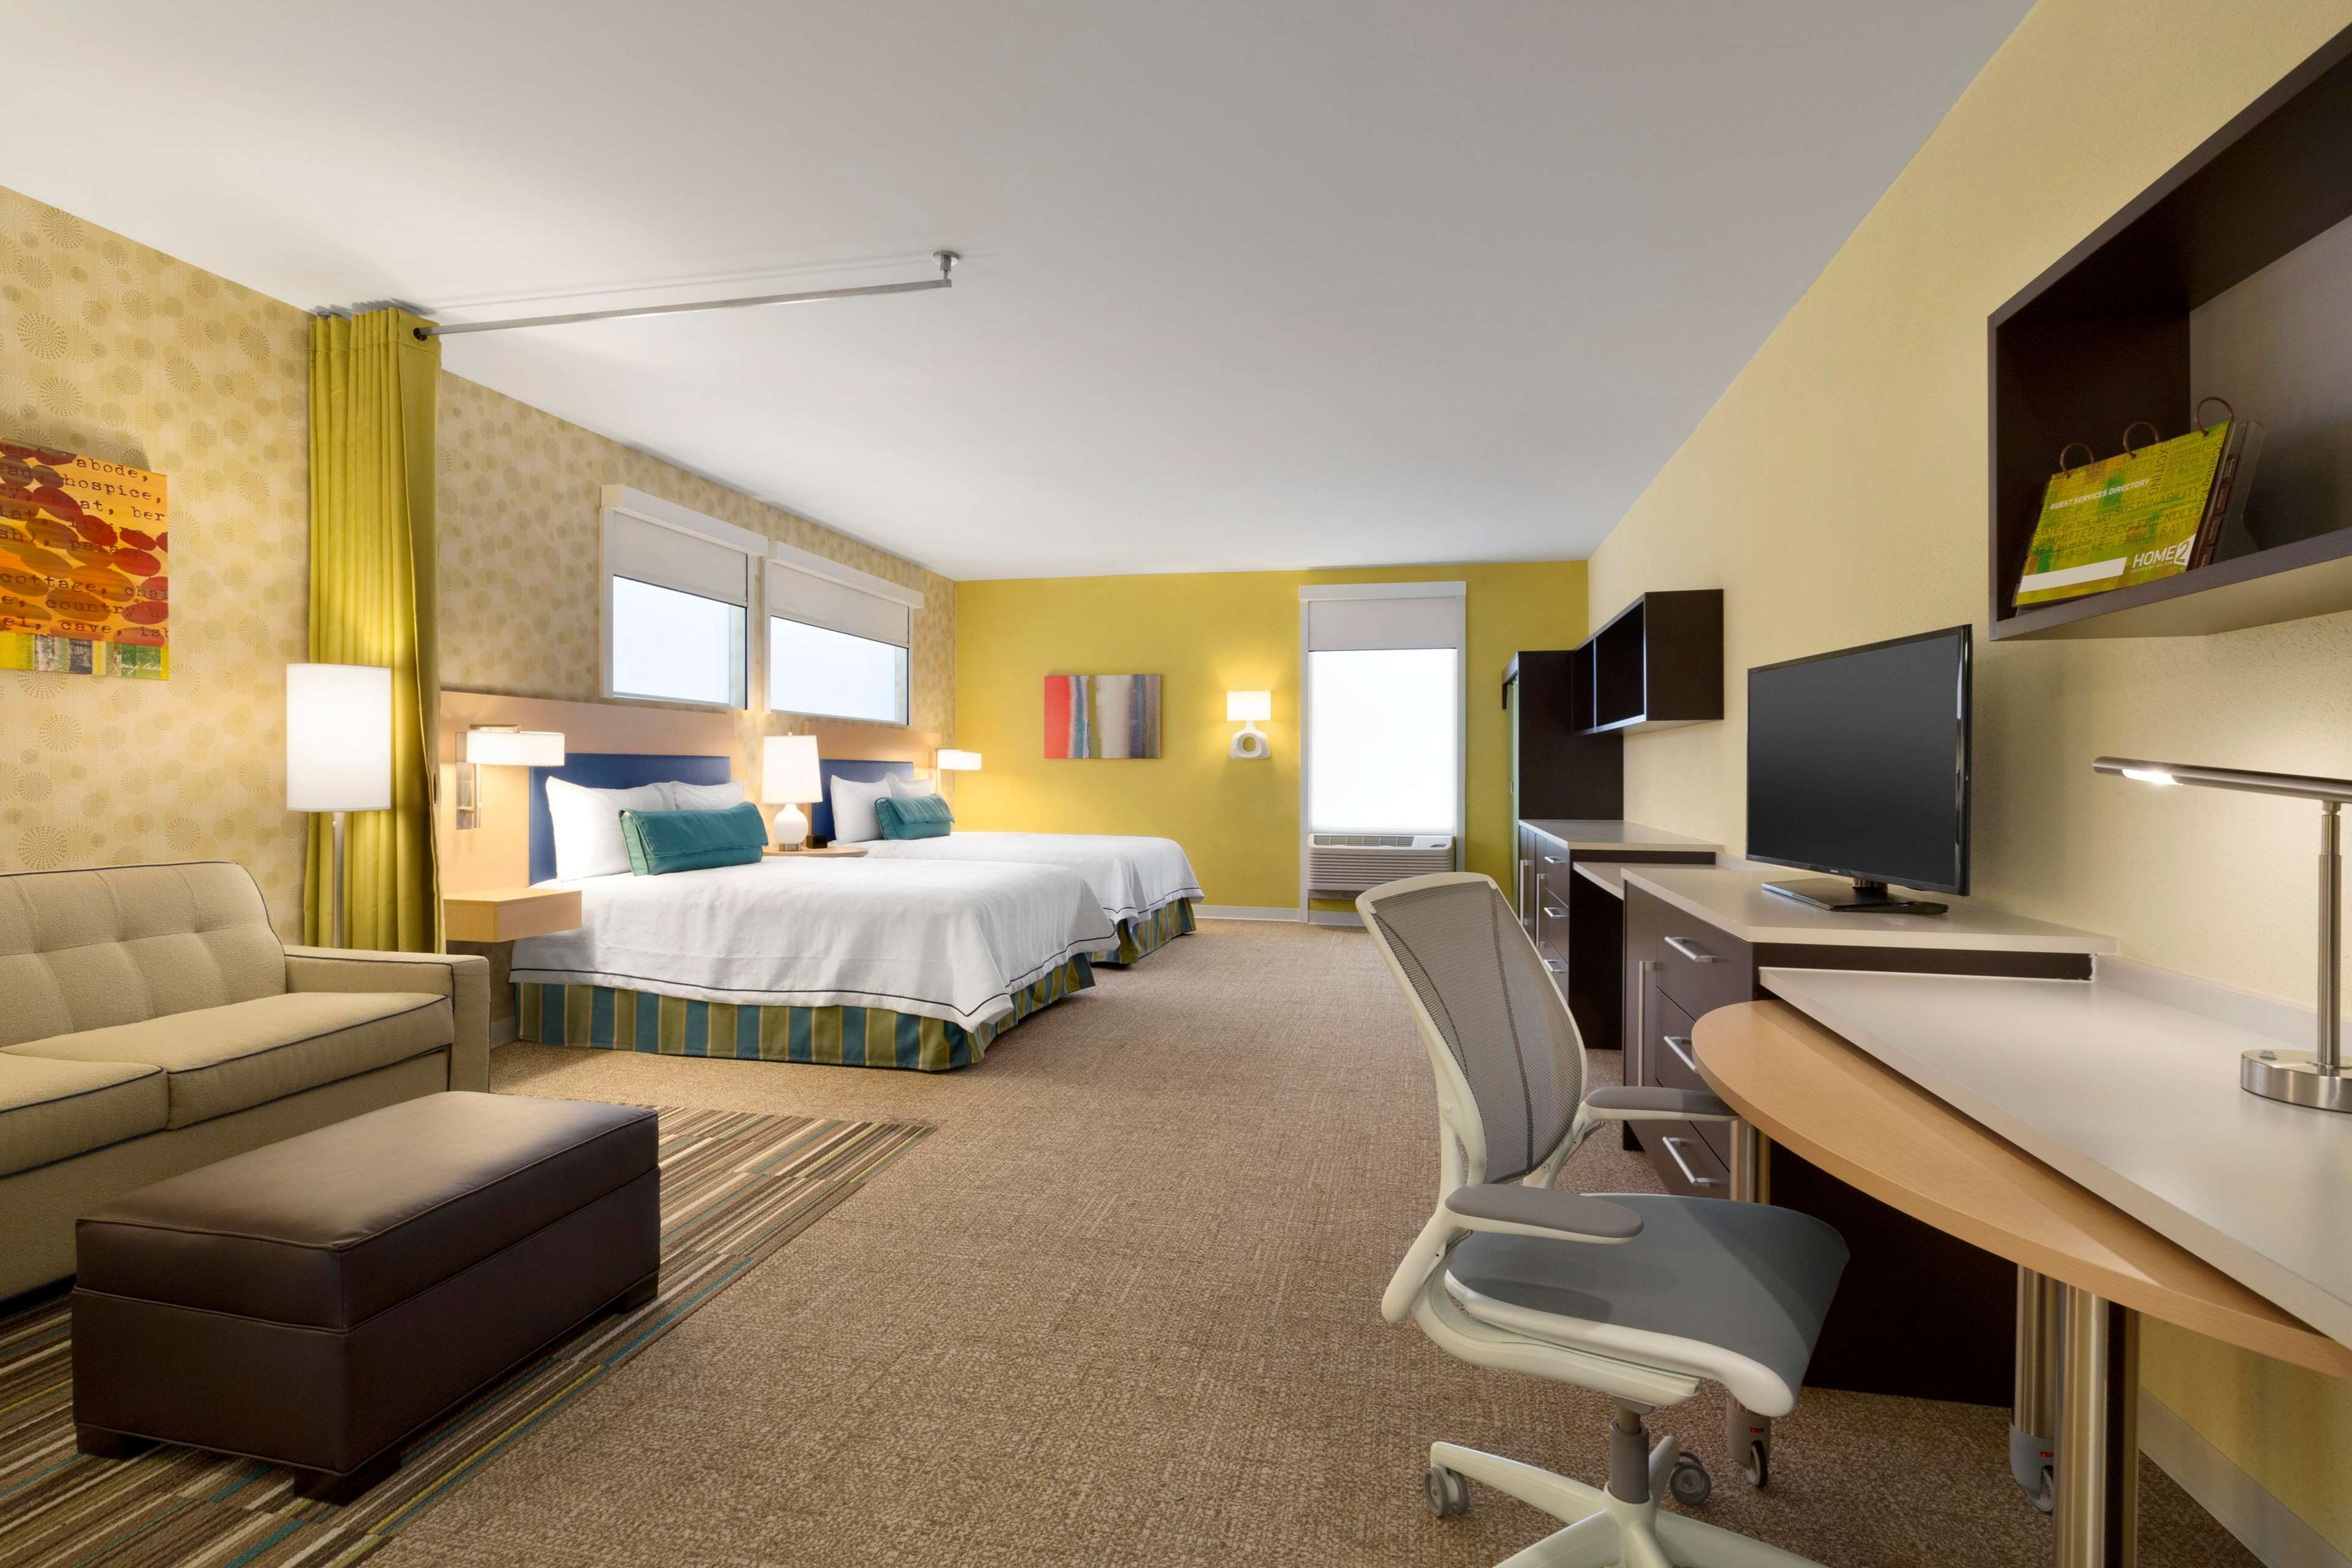 Home2 Suites by Hilton Houston Pasadena image 6